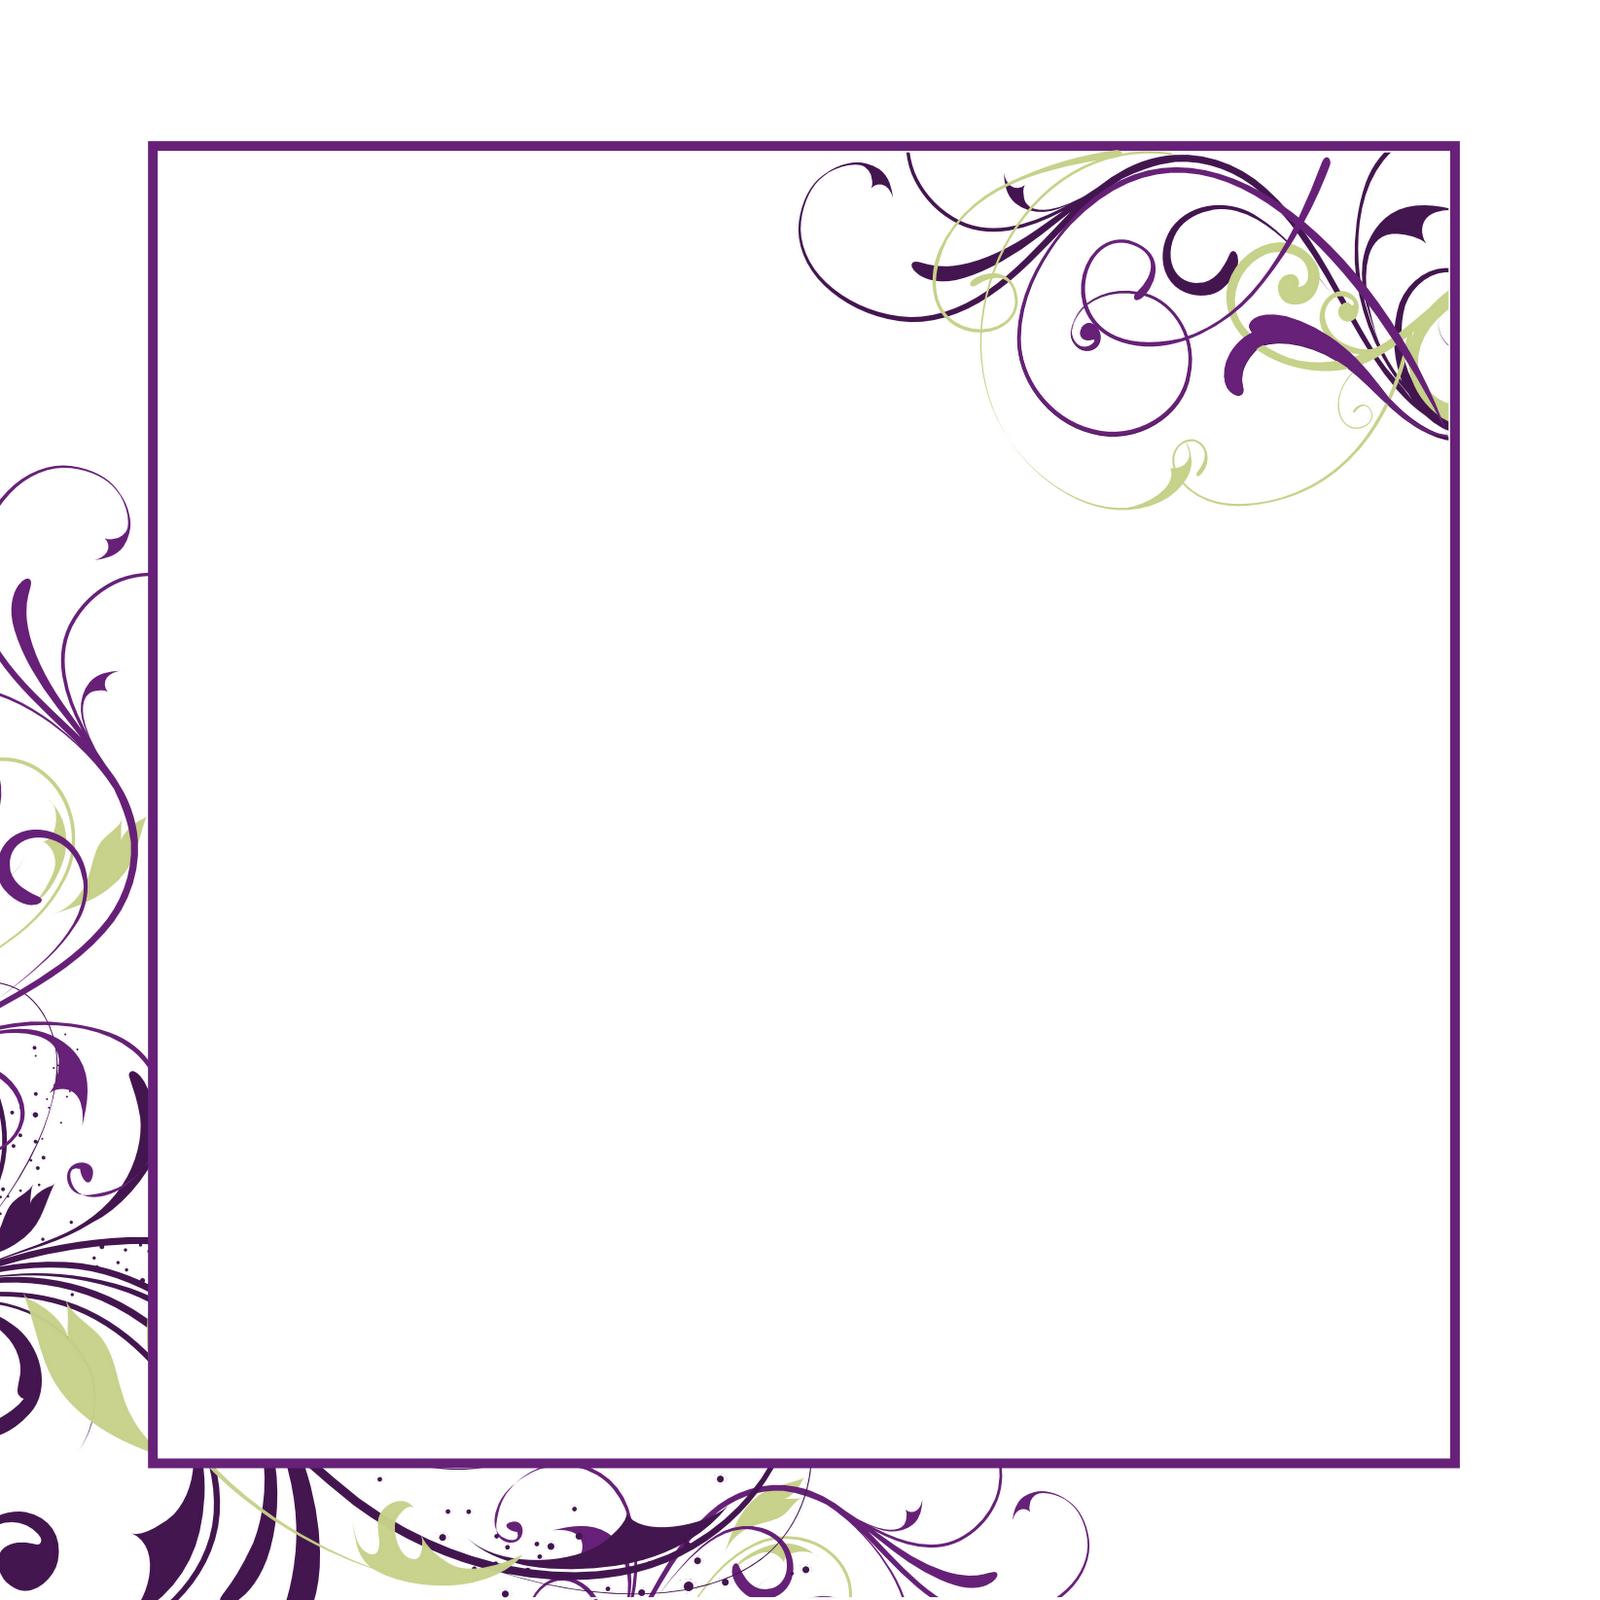 Wedding Invitation Templates Blank: Signatures By Sarah: Wedding Stationary, Rehearsal